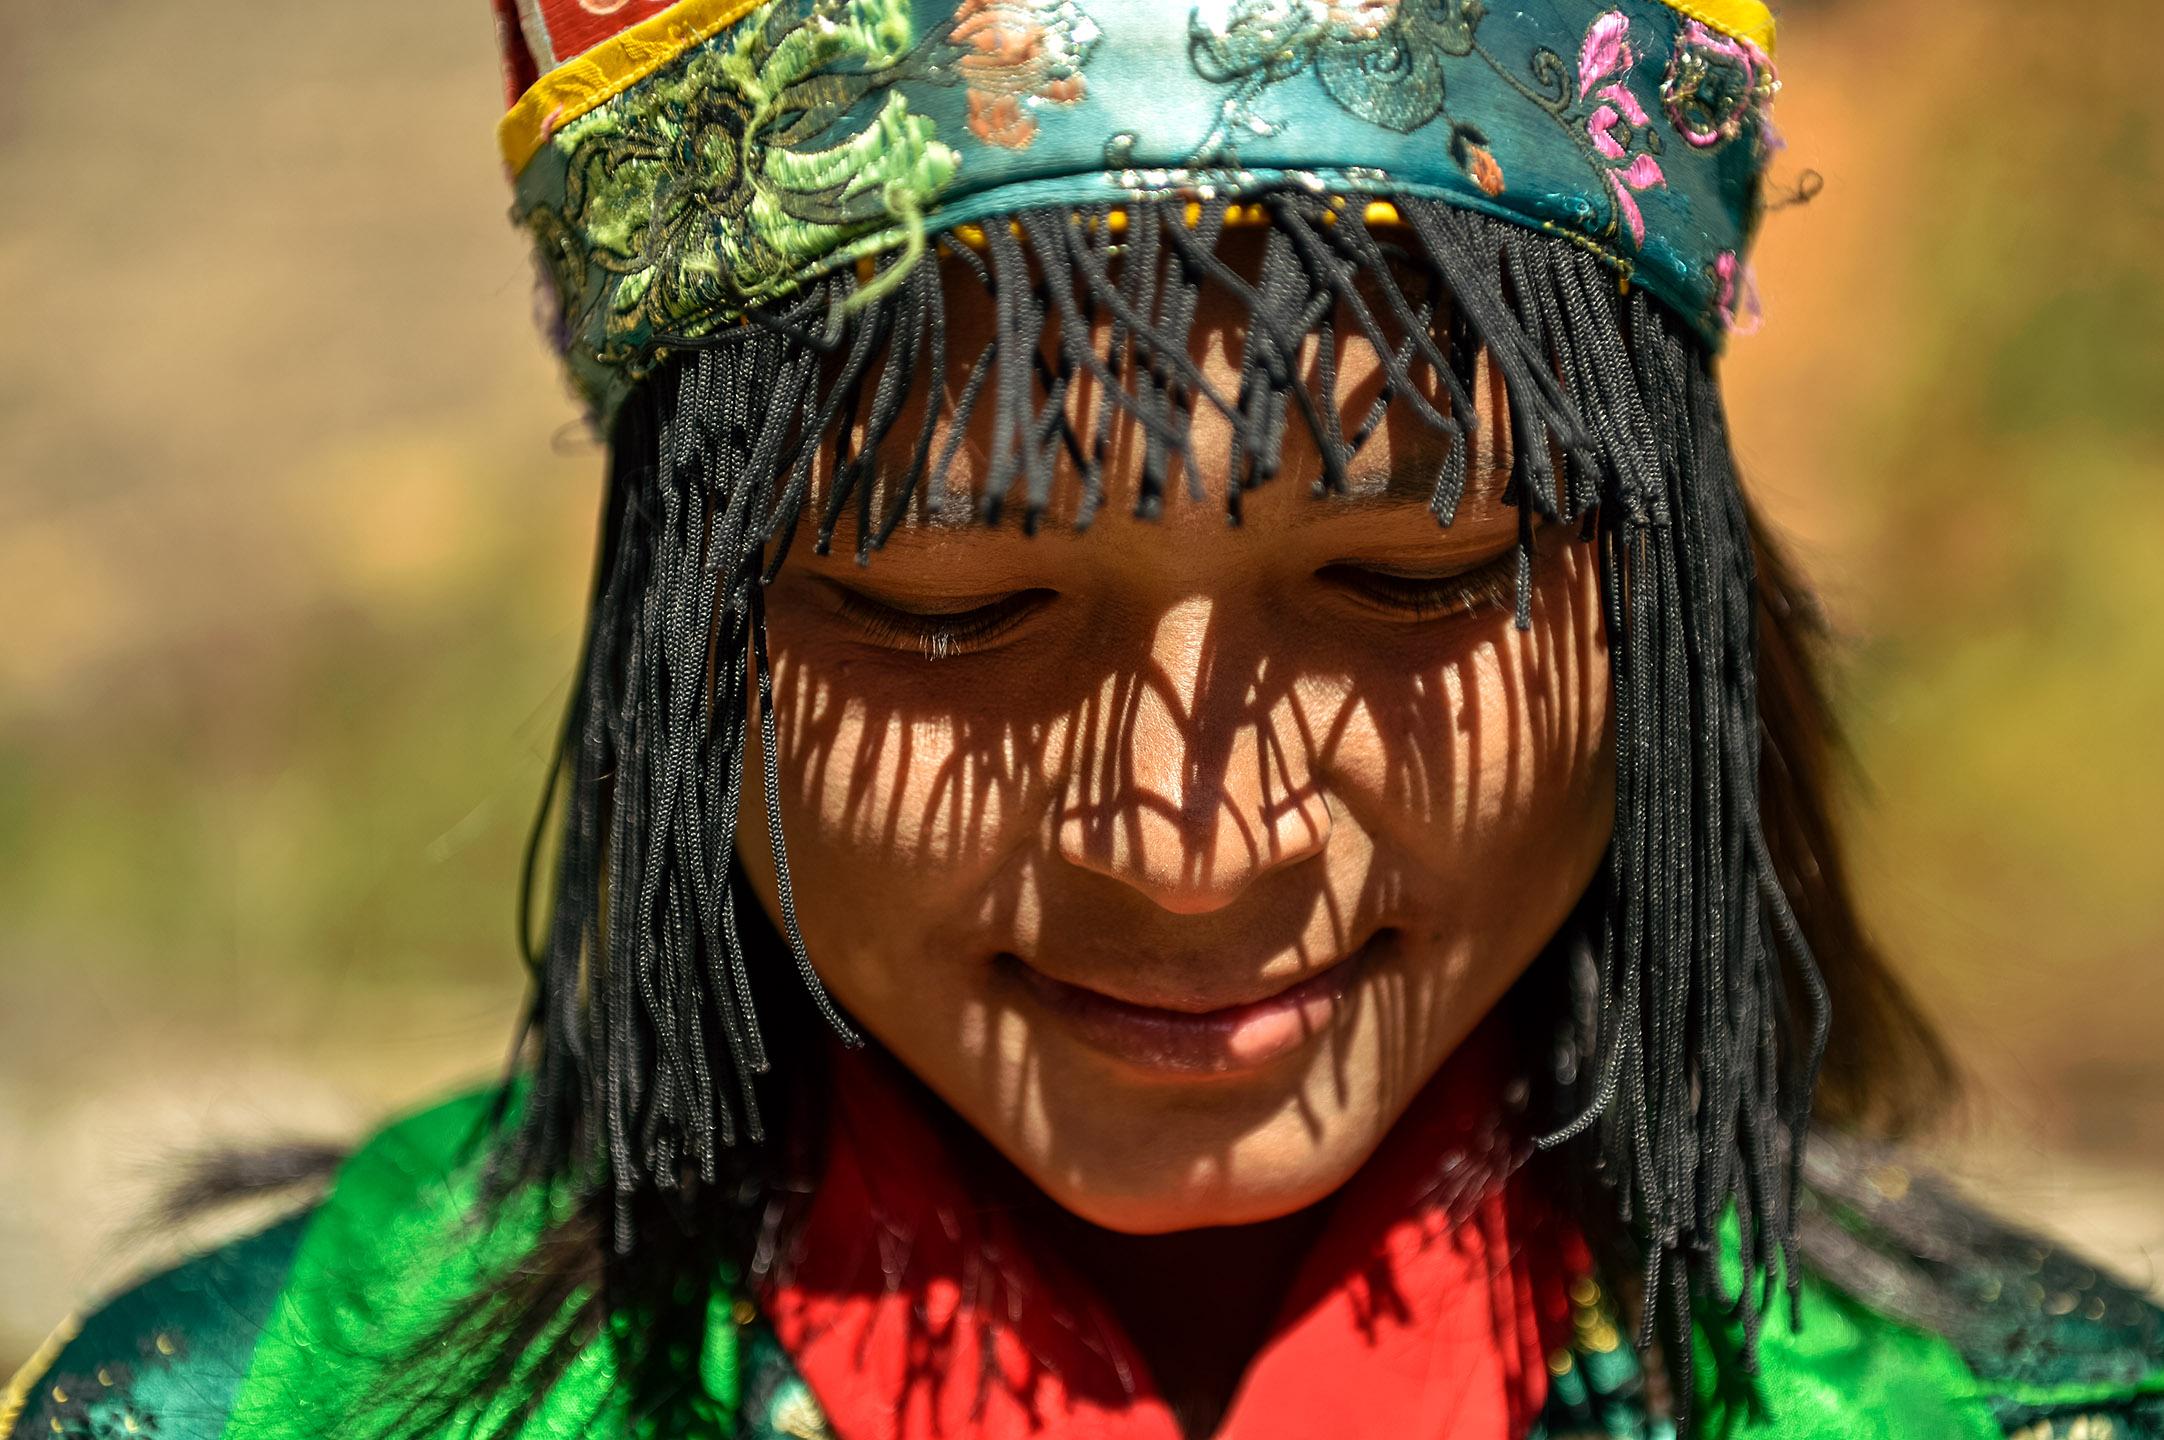 SCOTT A WOODWARD_2SW1943 (Bhutan)